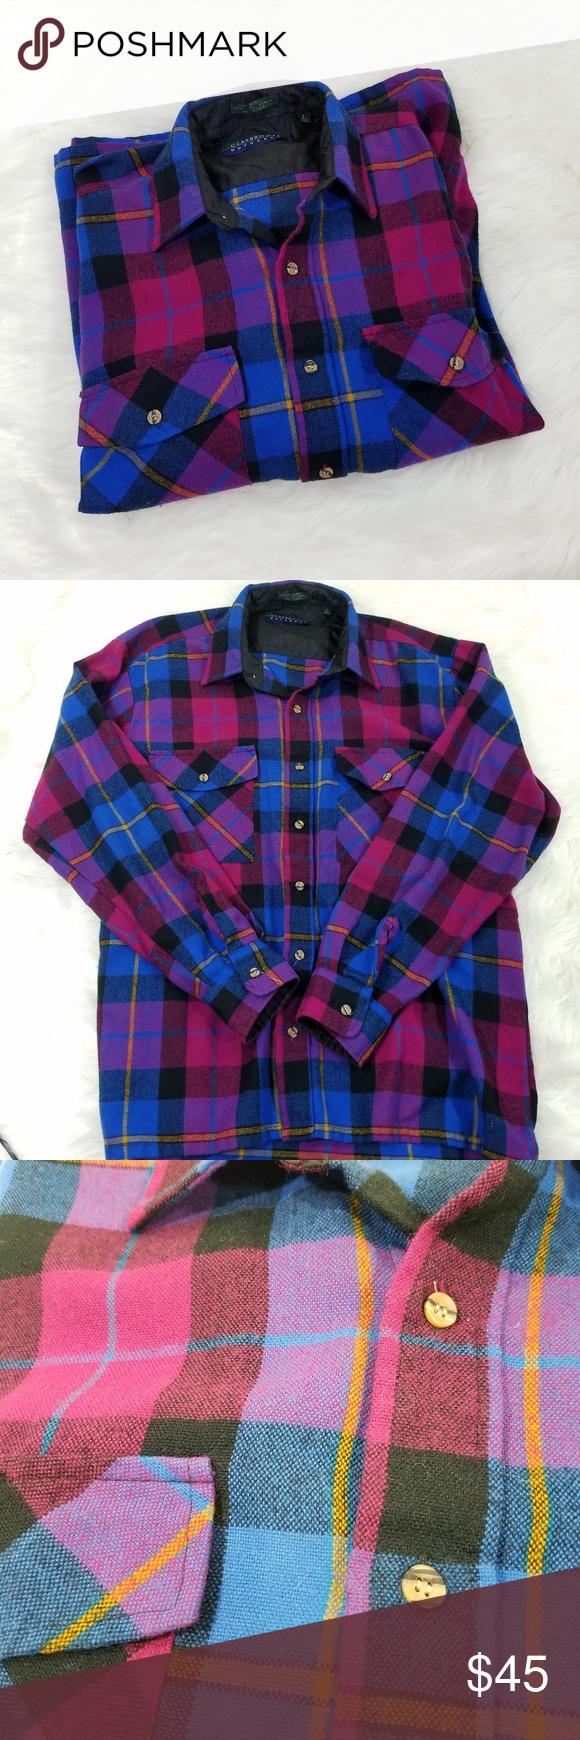 Flannel shirt vintage  Vintage Unisex Pink Tone Plaid Flannel Shirt  My Posh Picks